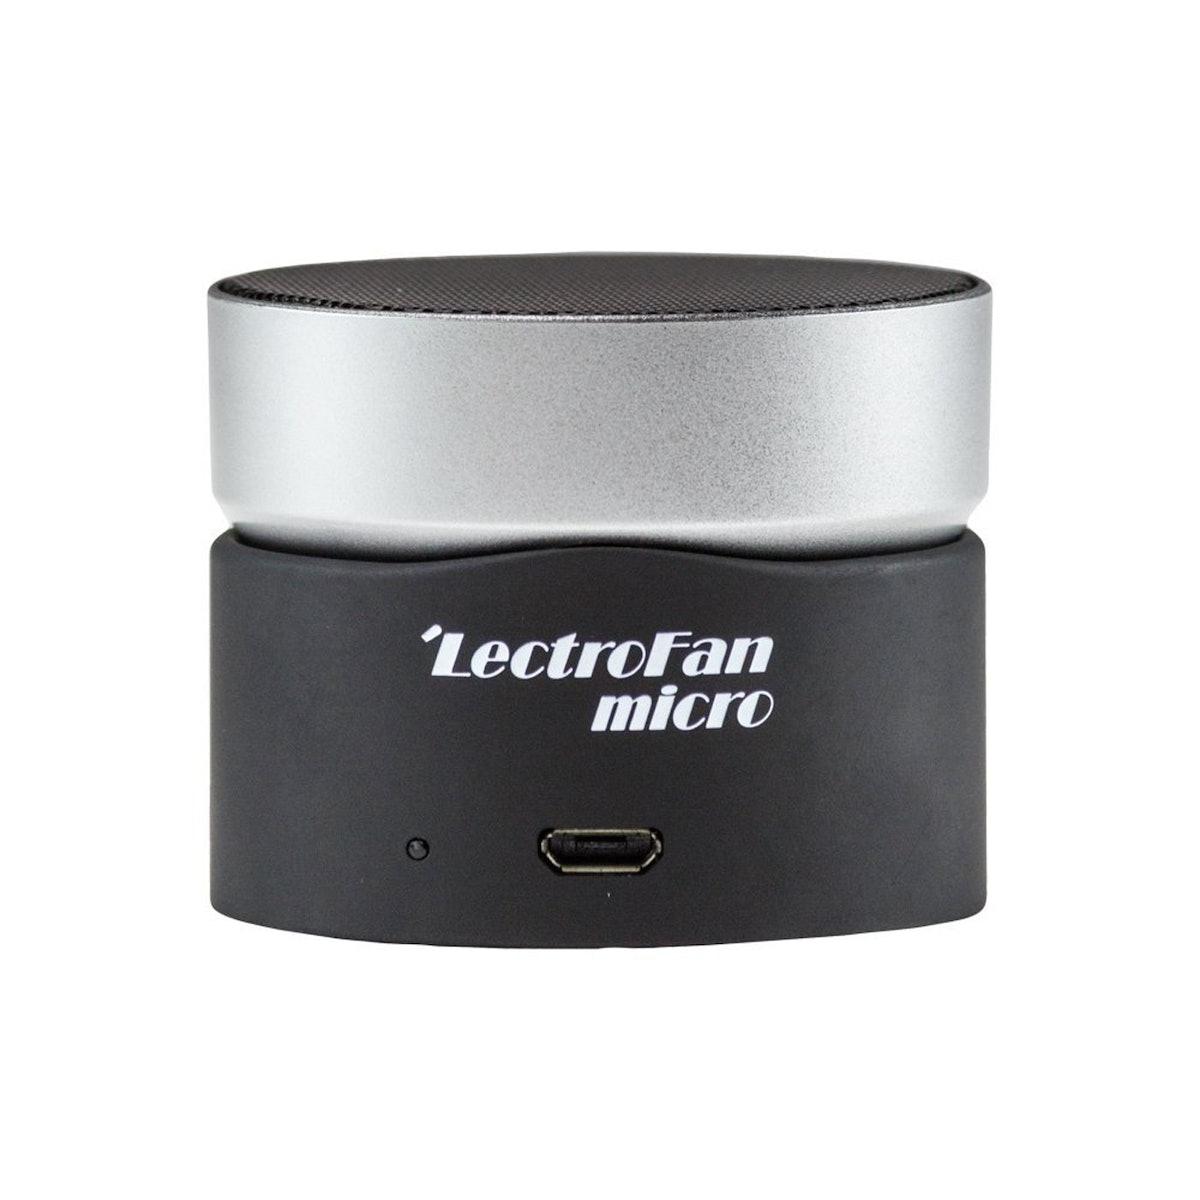 LectroFan Micro Wireless Sleep Sound Machine